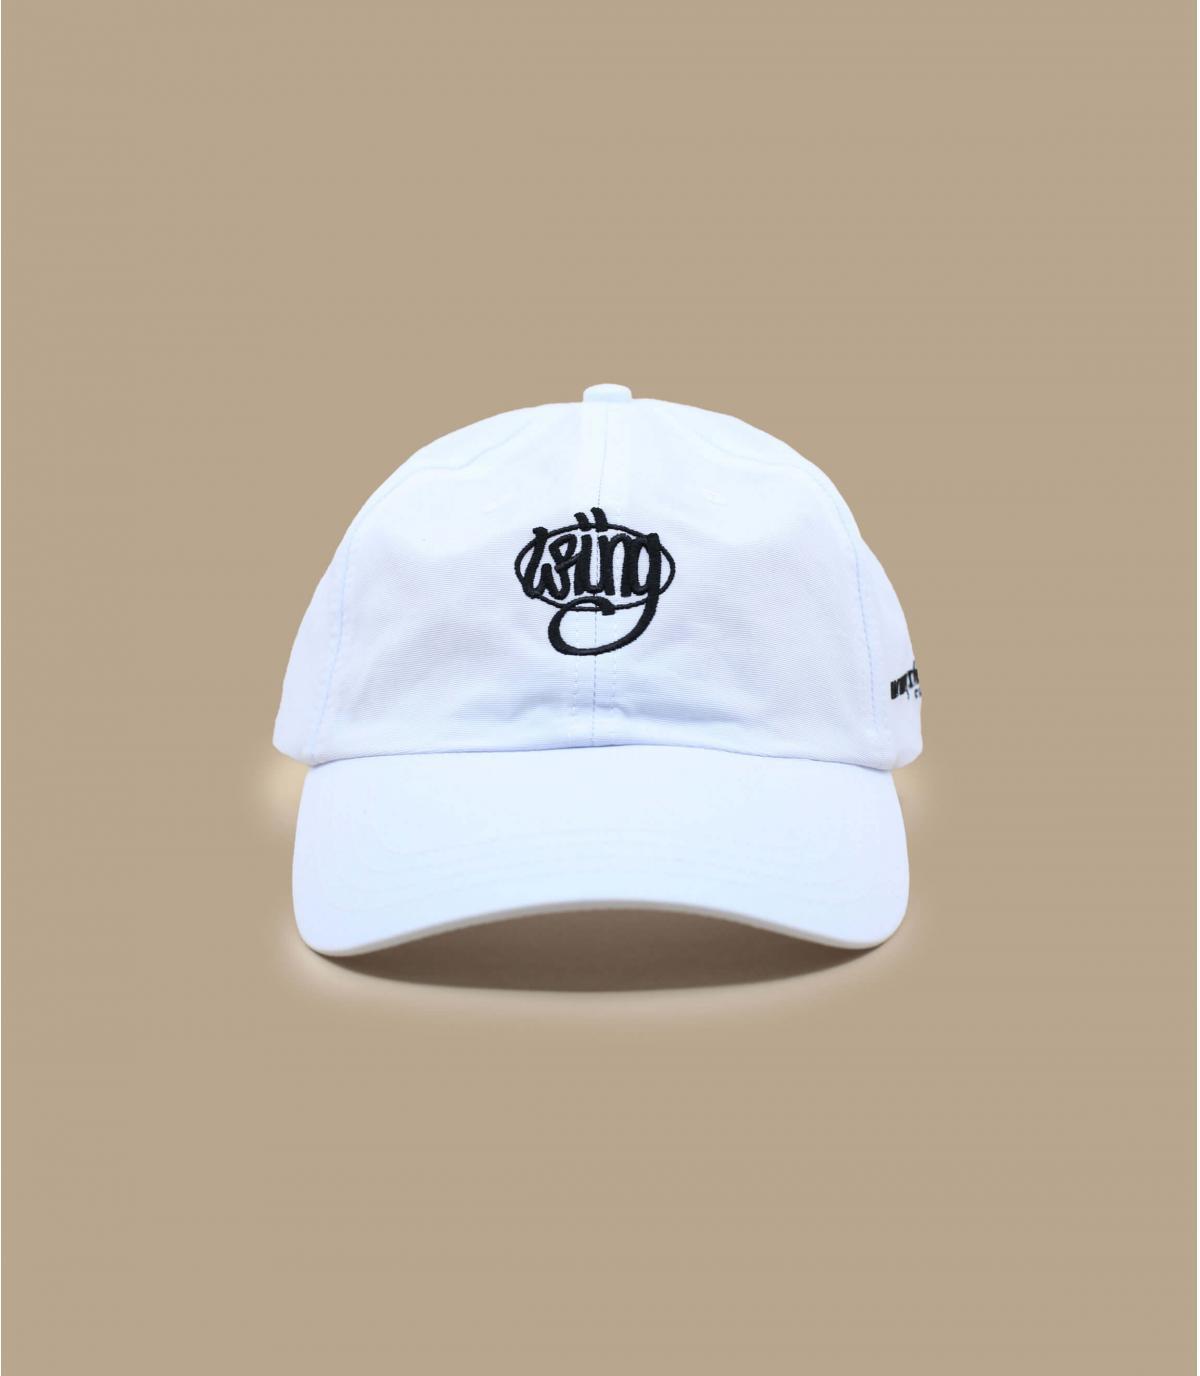 casquette Wrung blanc logo90